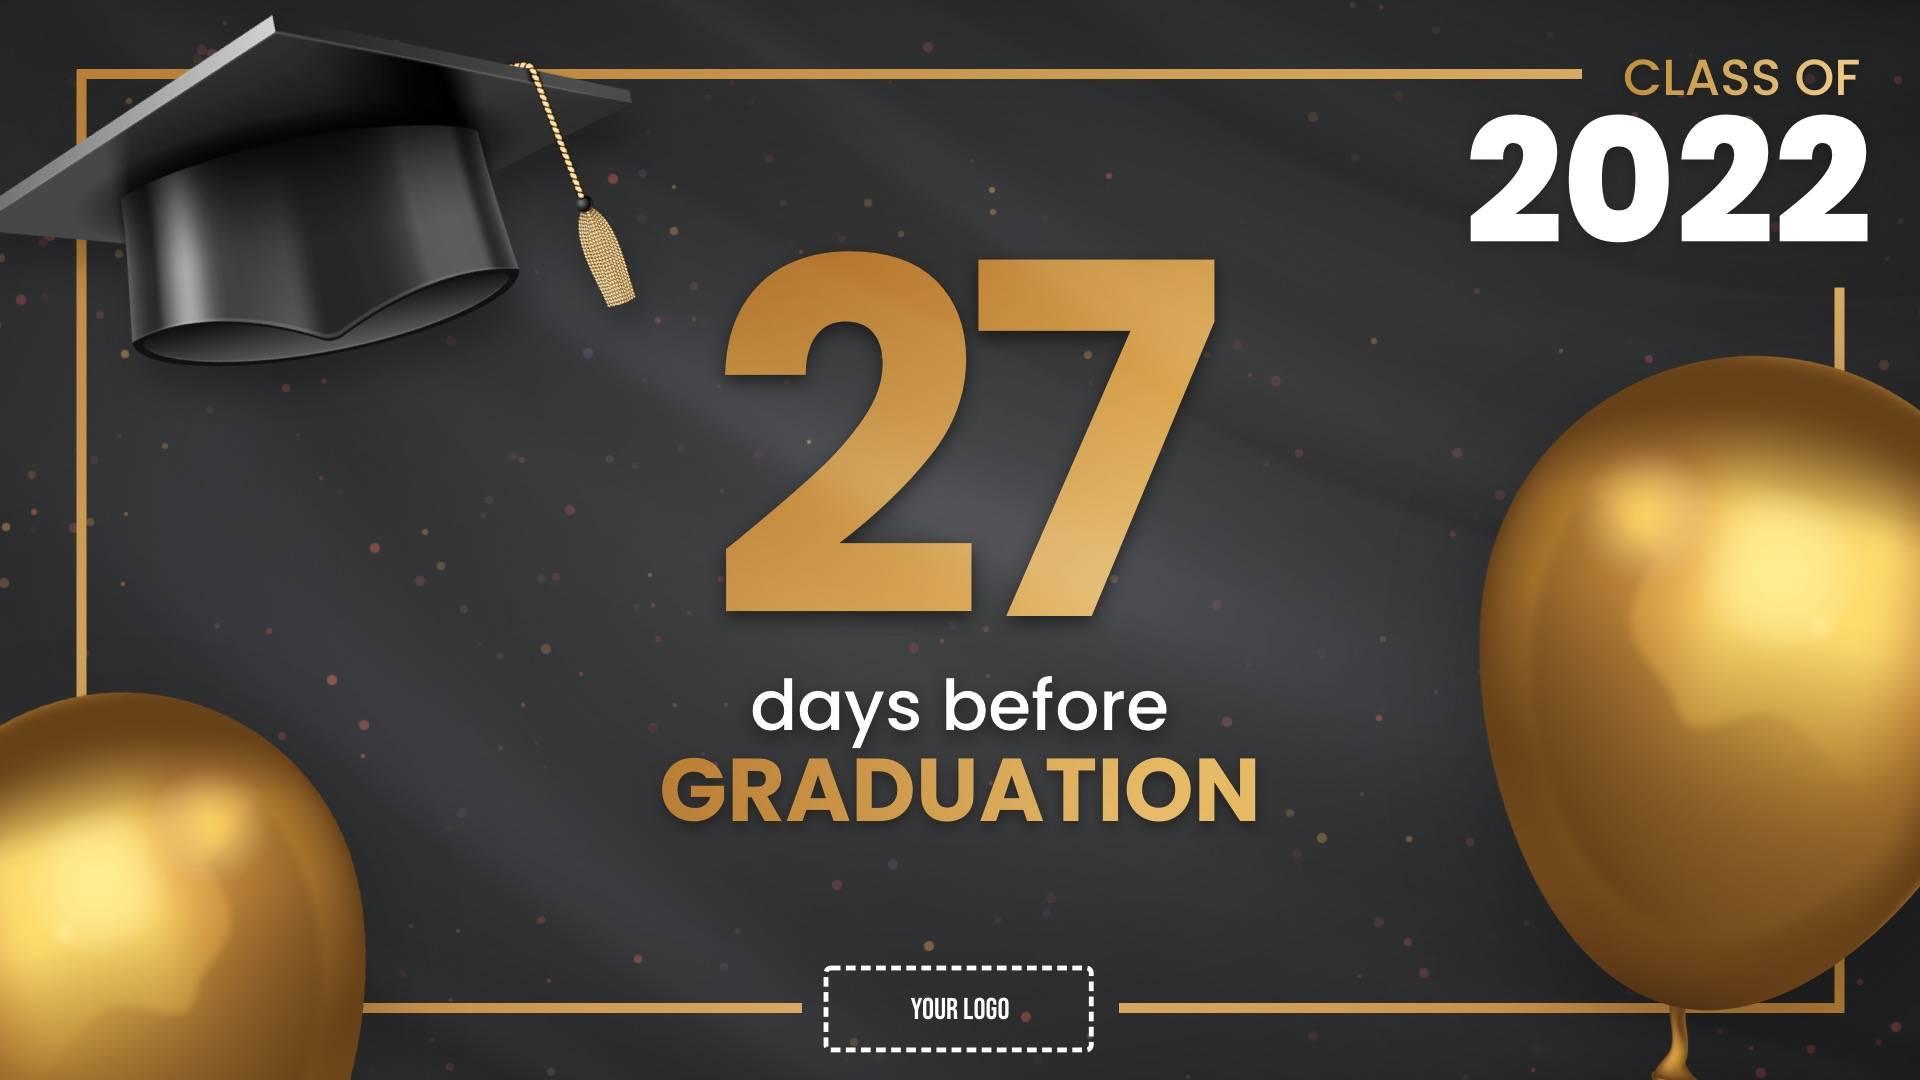 Graduation Countdown Digital Signage Template